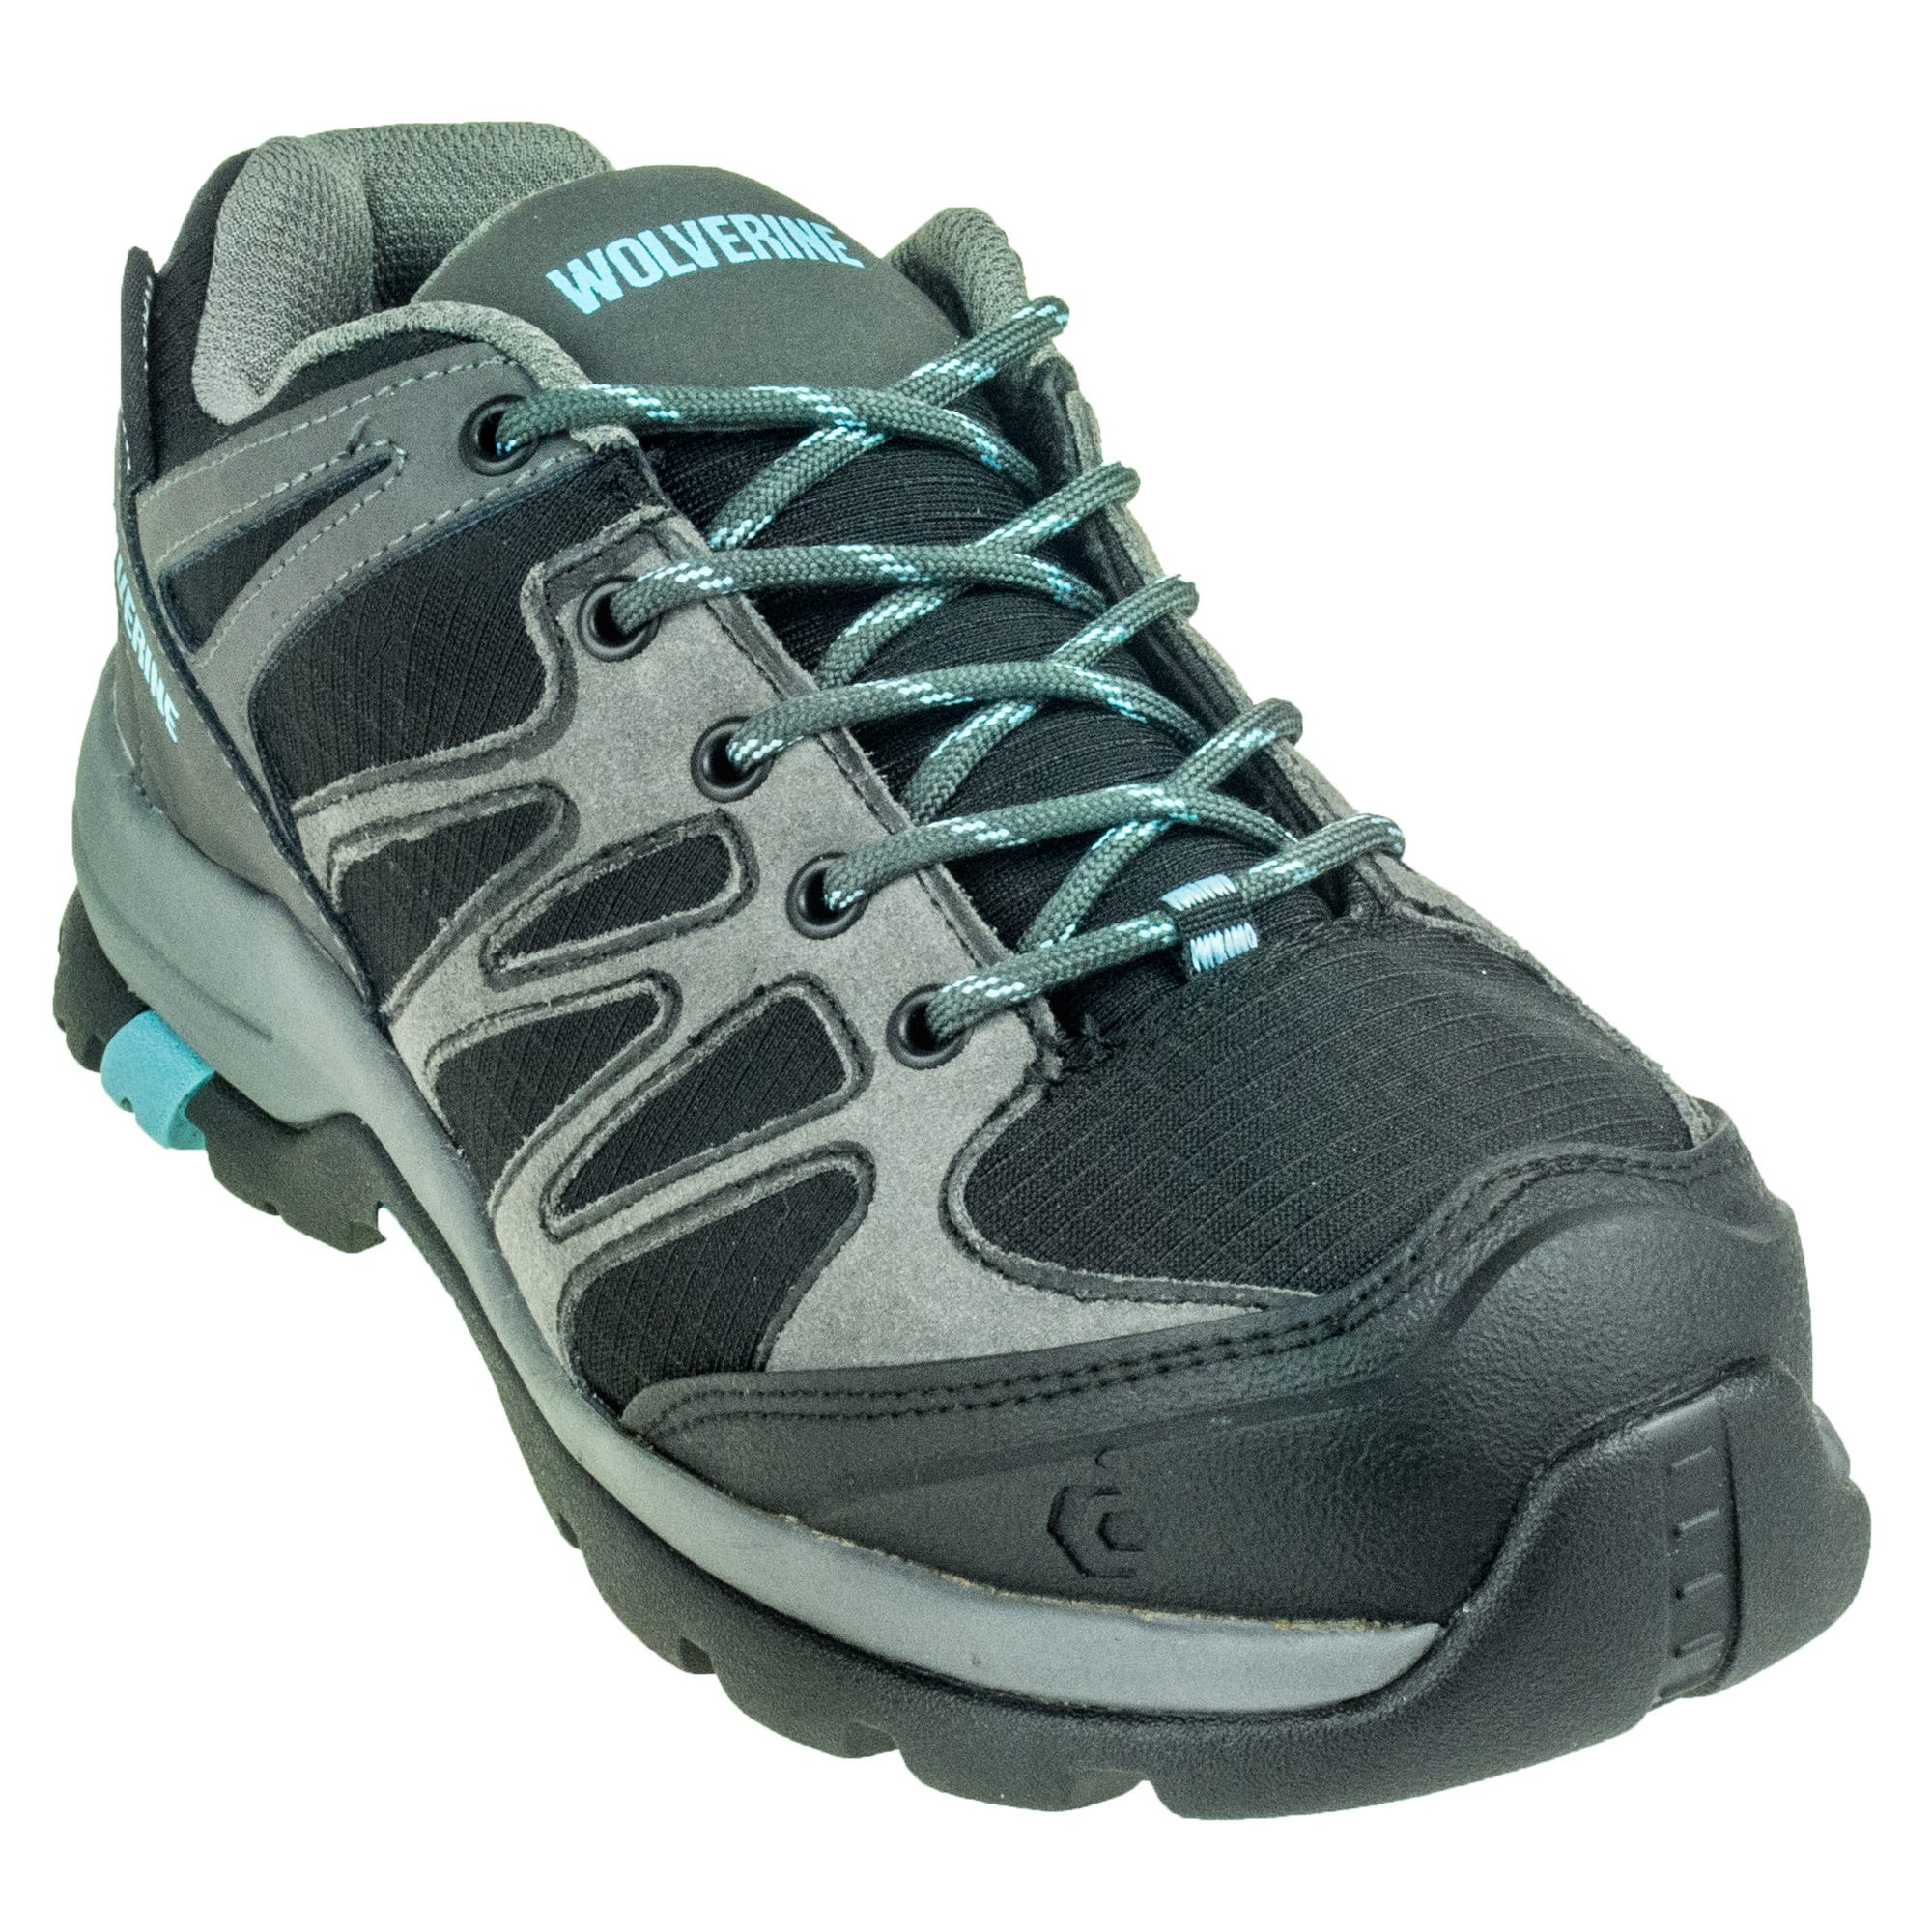 Wolverine Women's Black Waterproof 10580 Fletcher Composite Toe Work Shoes